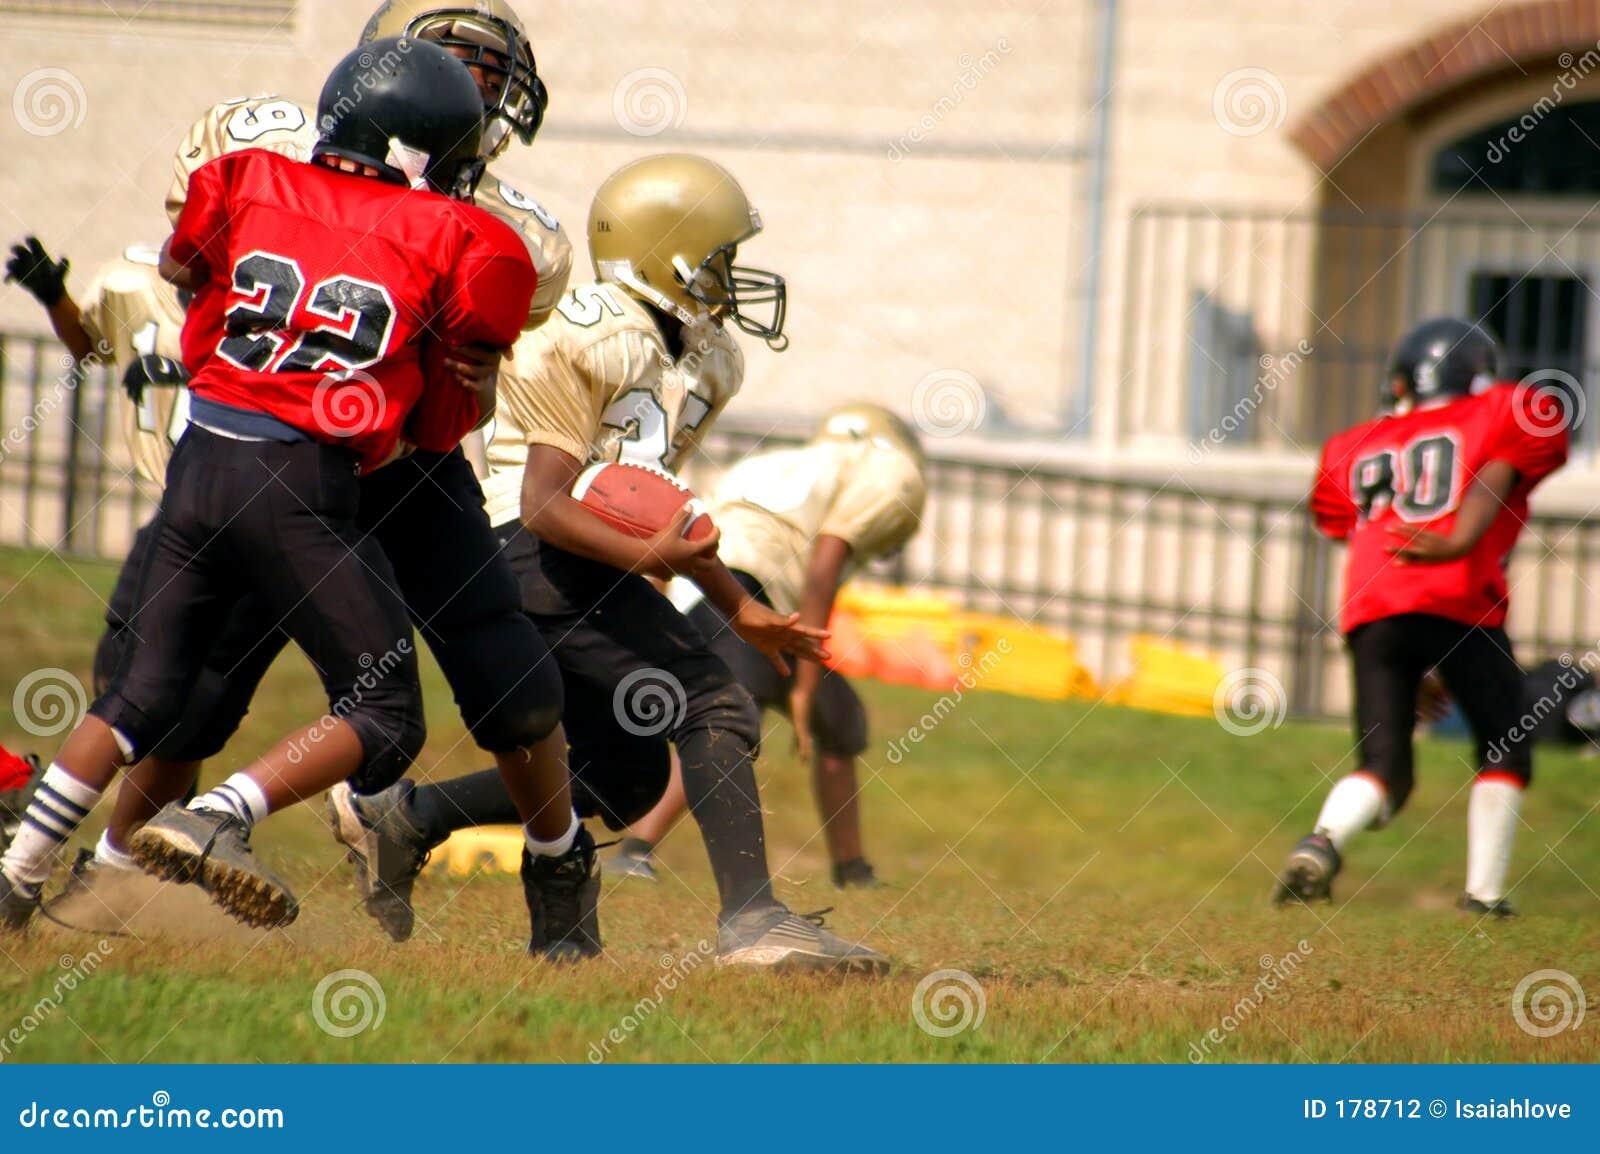 Football1青年时期